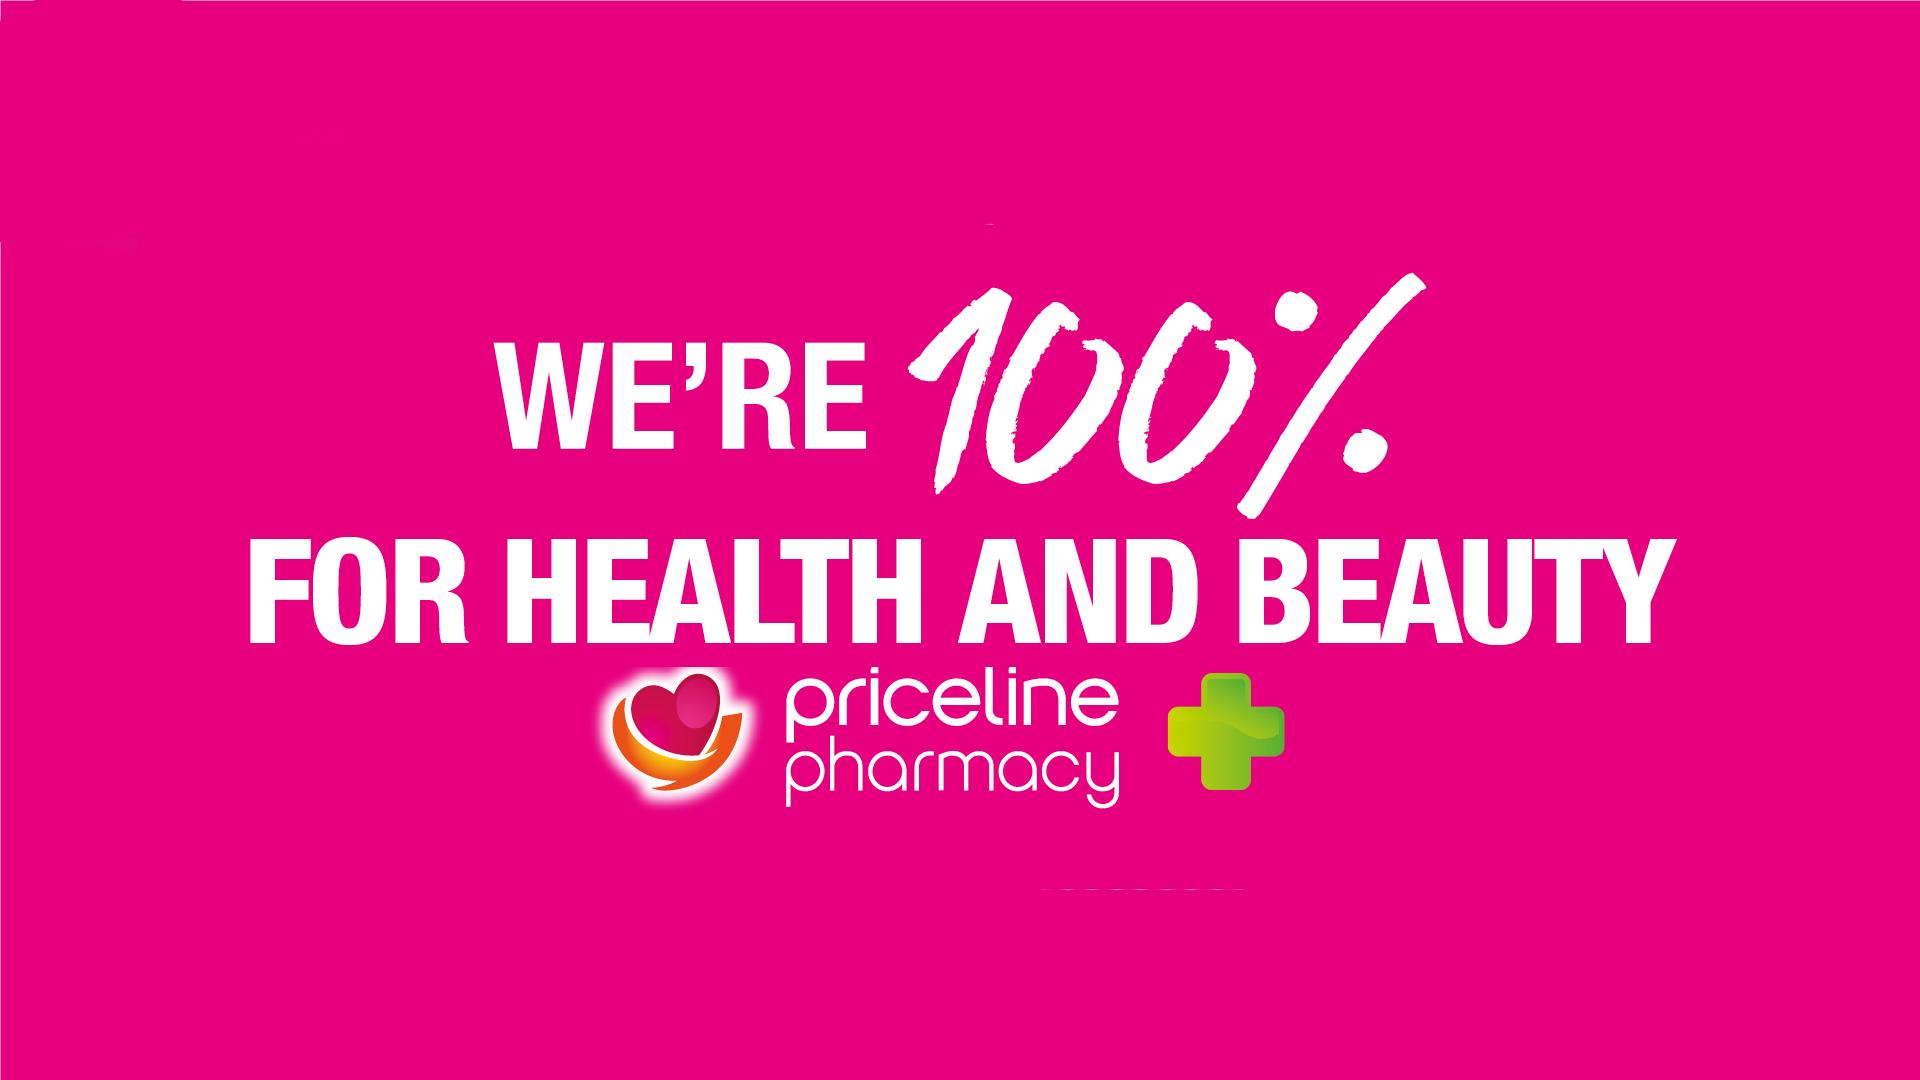 Priceline launches next generation store - BioPharmaDispatch